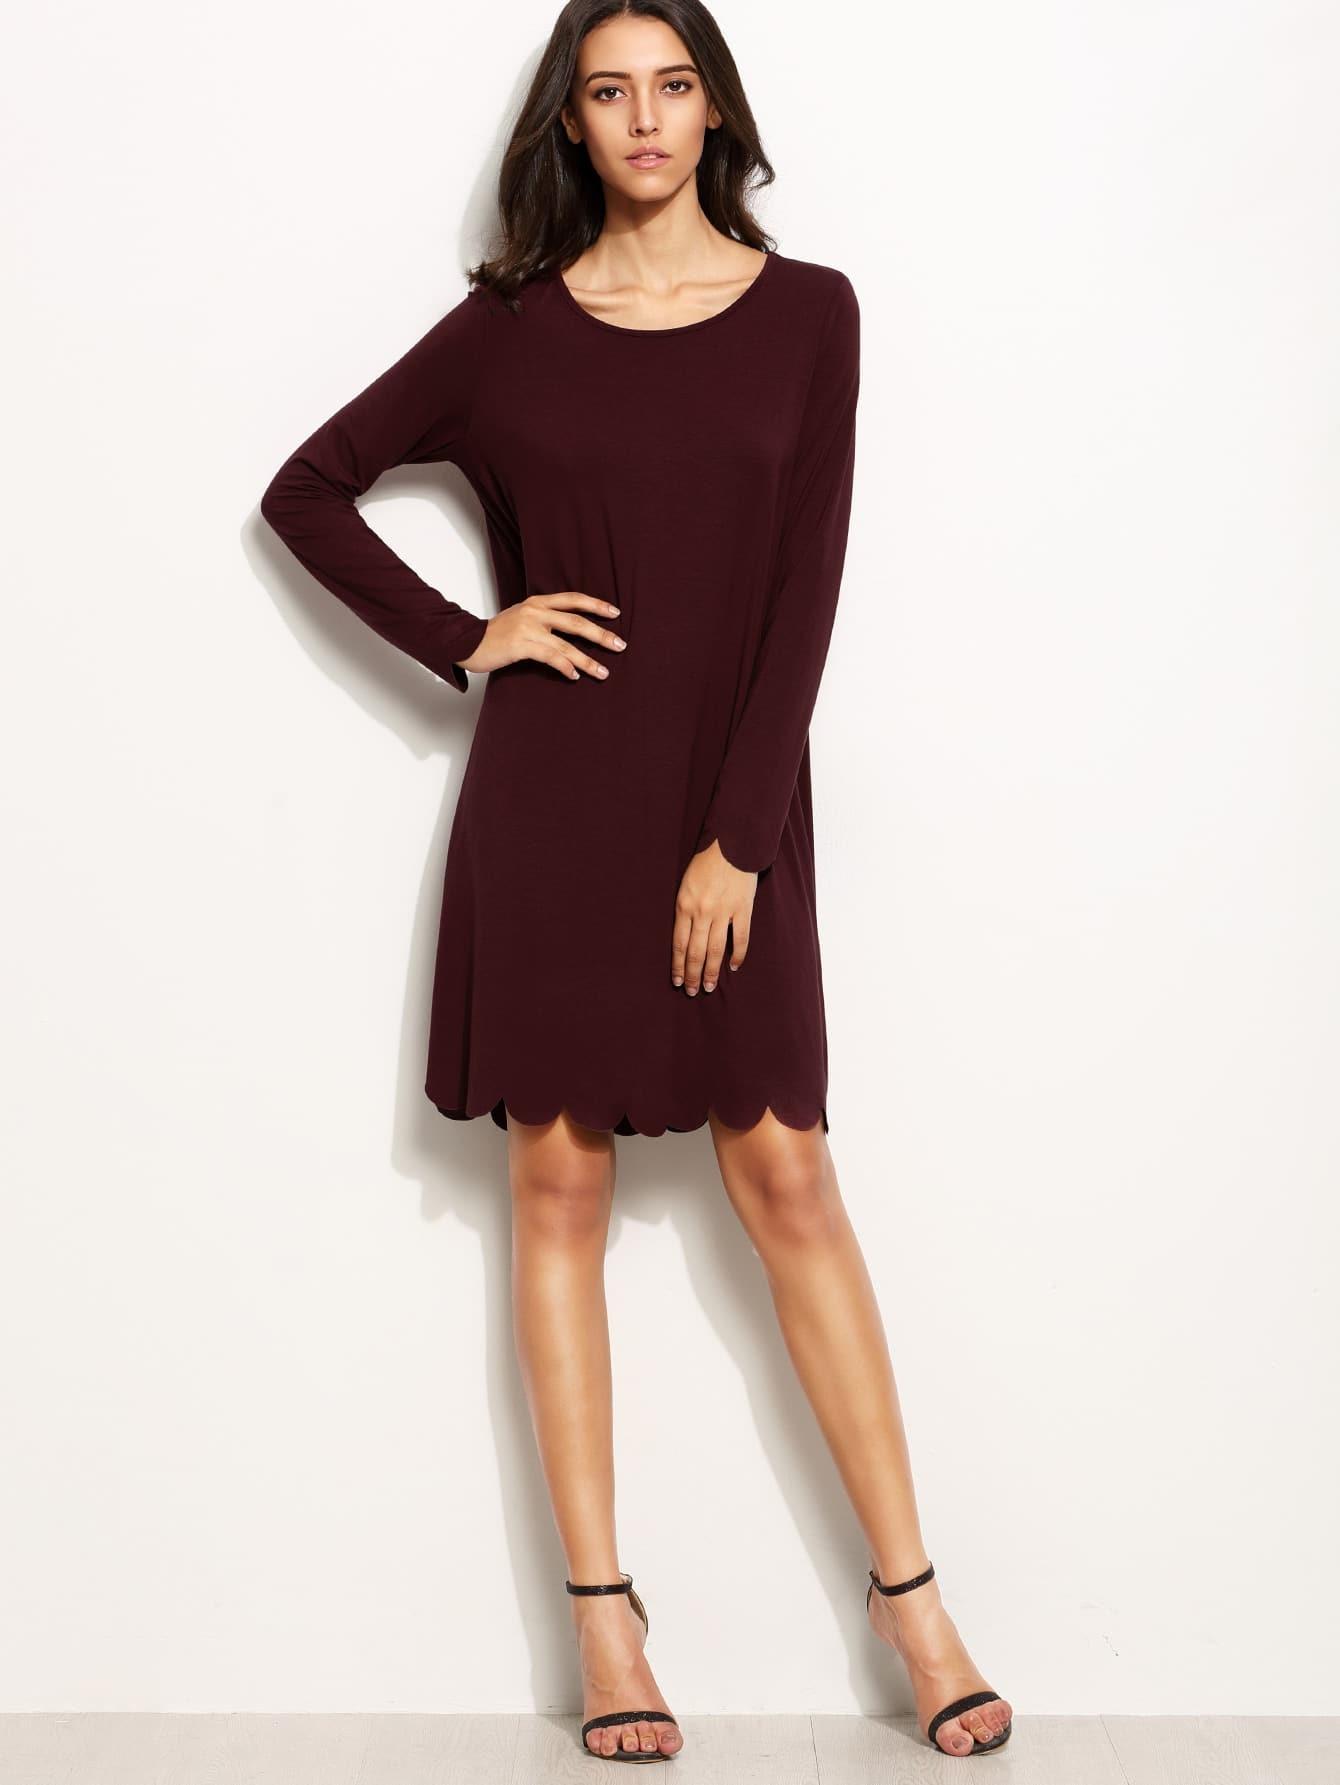 Burgundy Scallop Trim Long Sleeve Shift DressBurgundy Scallop Trim Long Sleeve Shift Dress<br><br>color: Burgundy<br>size: L,M,S,XS